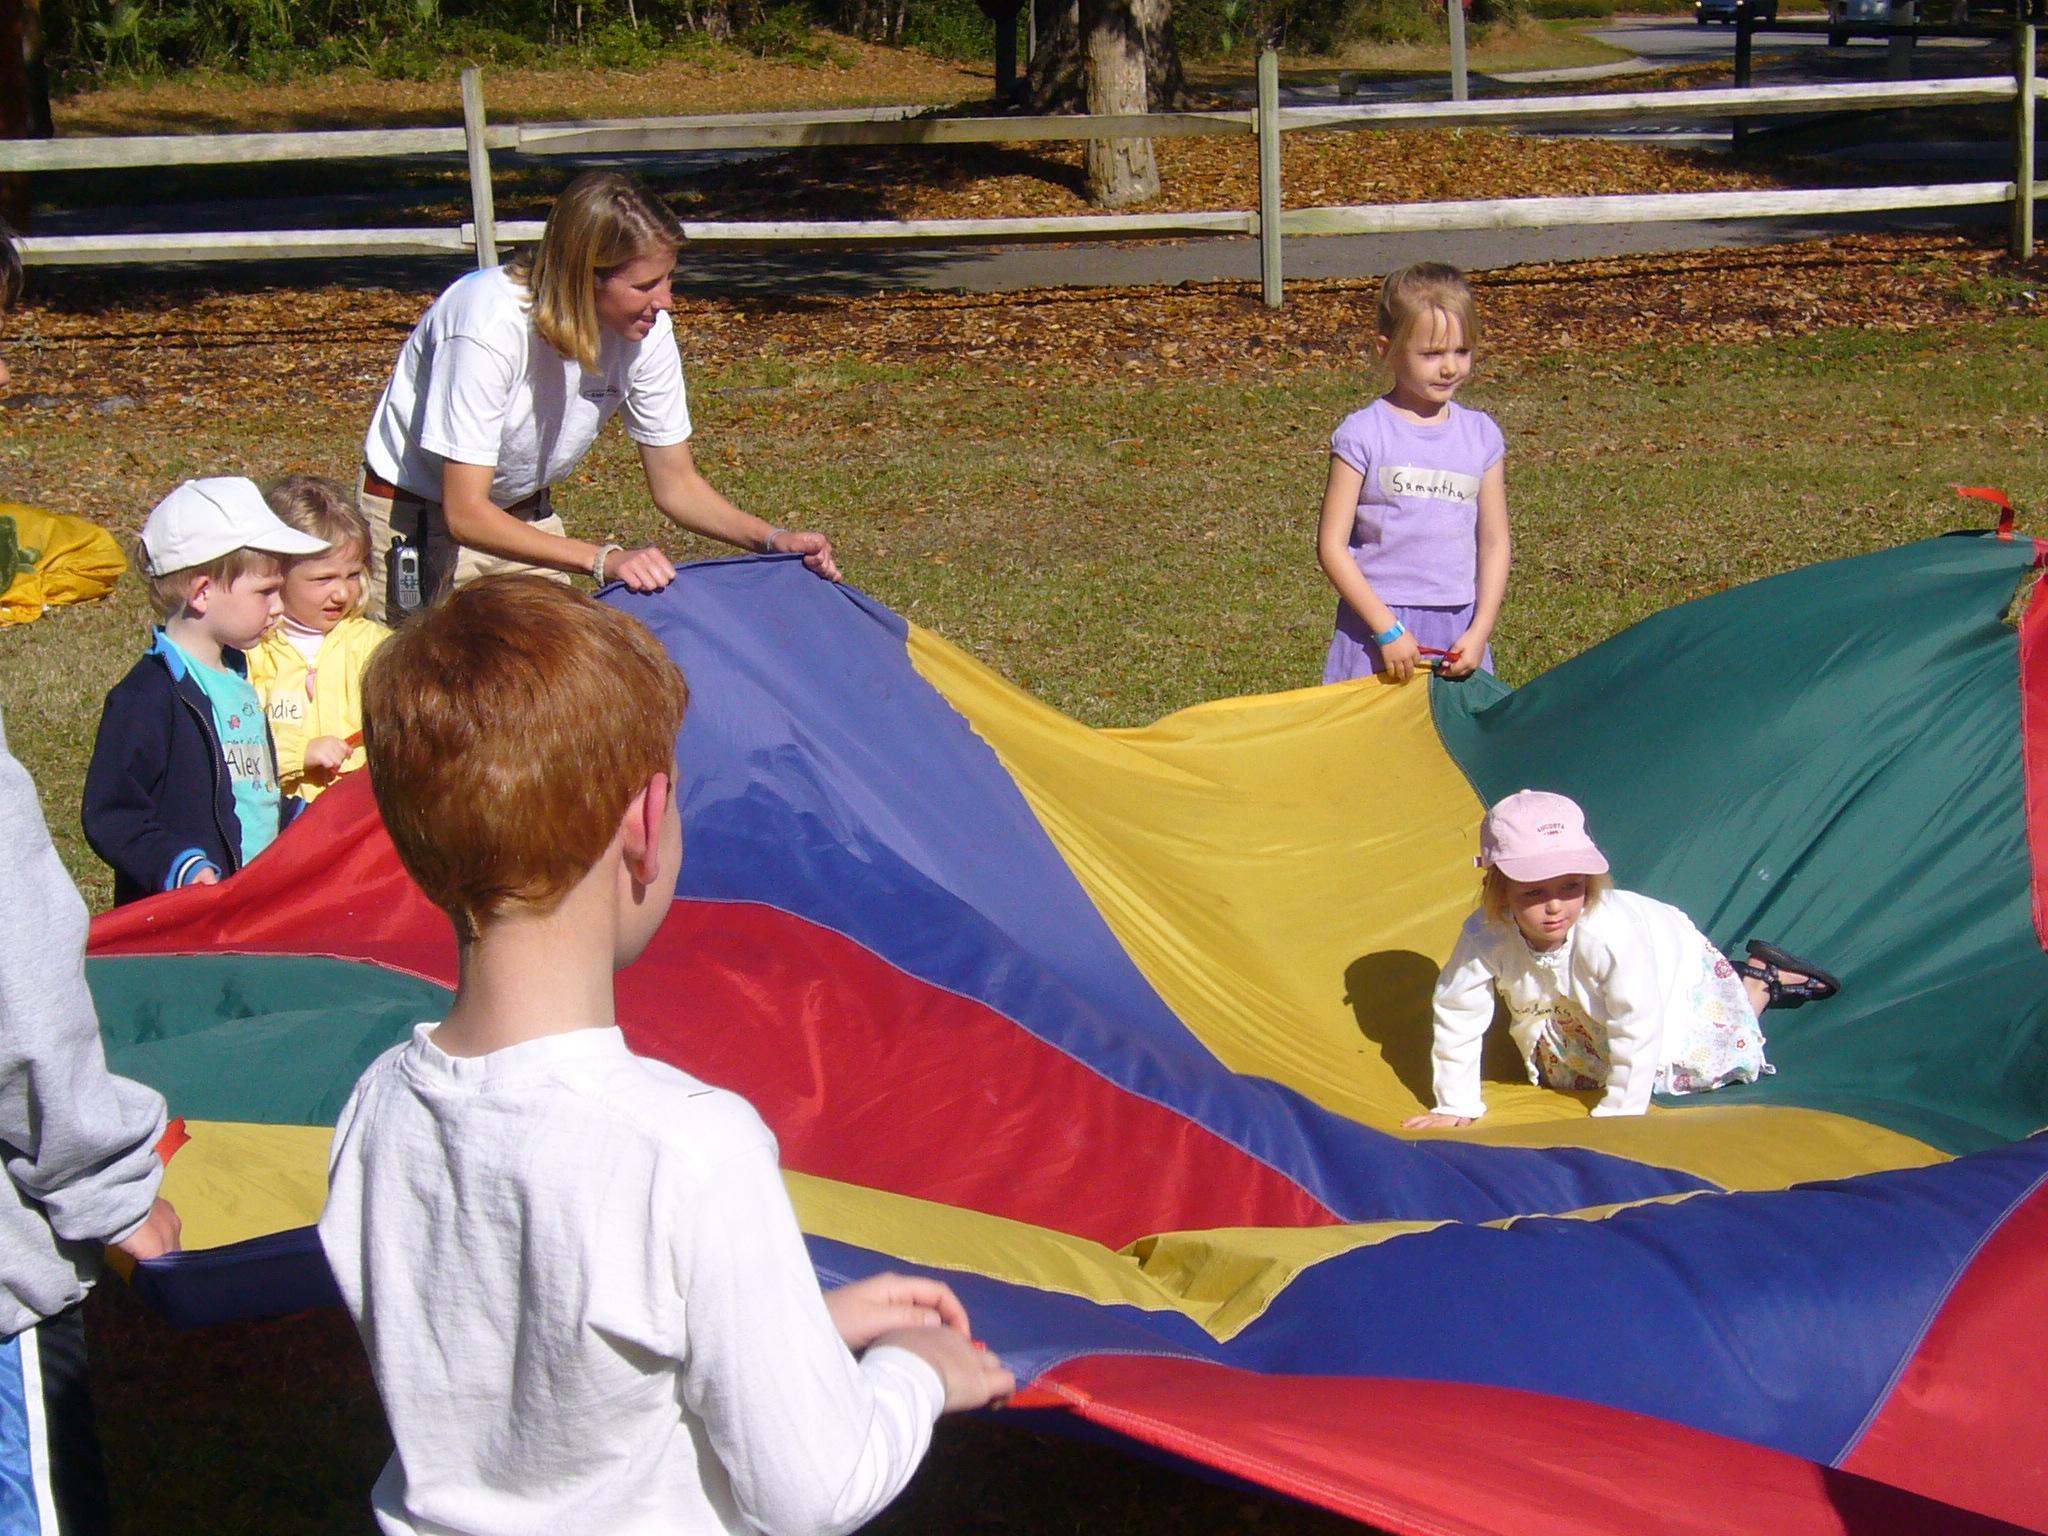 Kamp Kiawah for Kids, ages 3-11